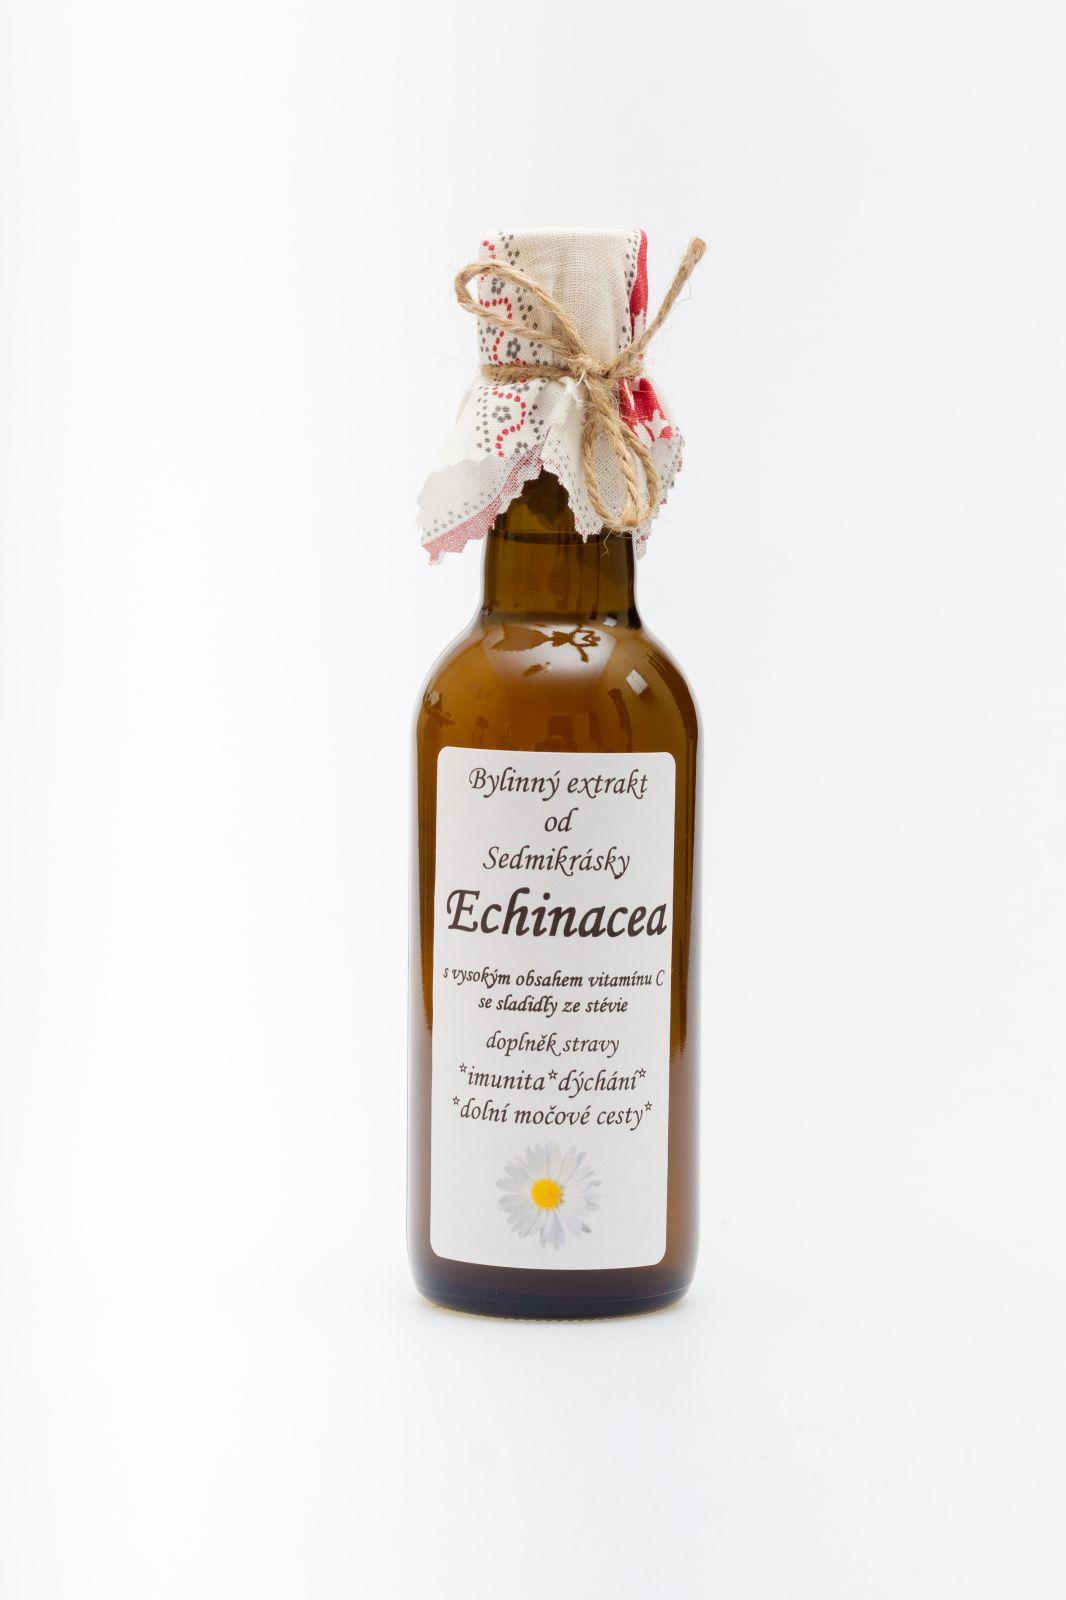 Bylinný extrakt Echinacea 250ml Rodinná farma Sedmikráska